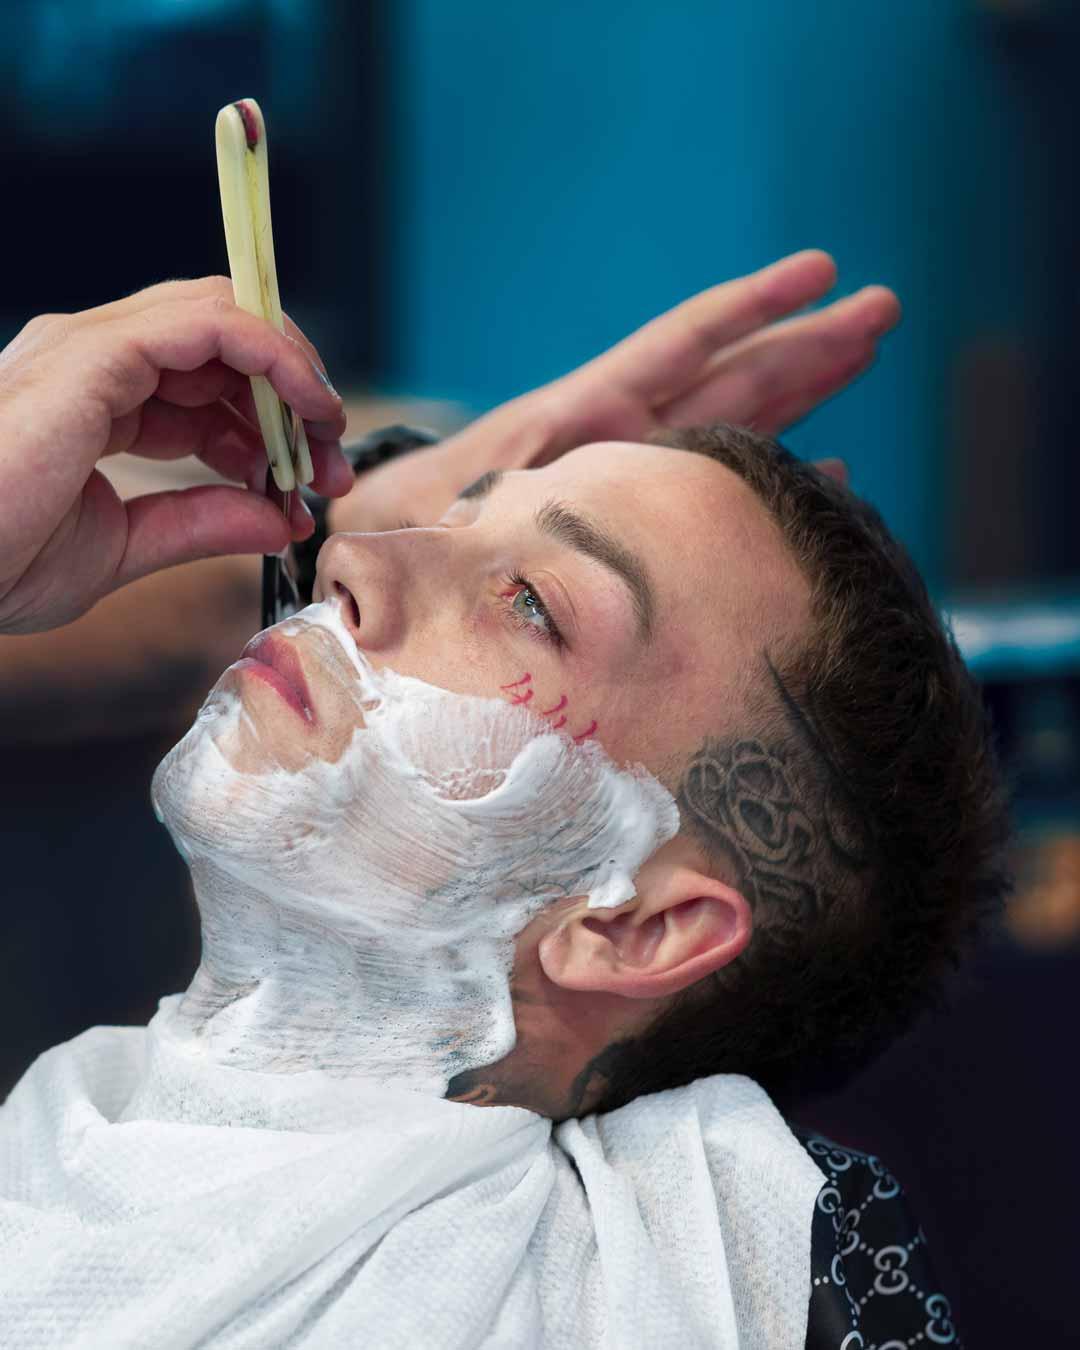 Traditional Cut Throat Shave At Morisset Barbershop